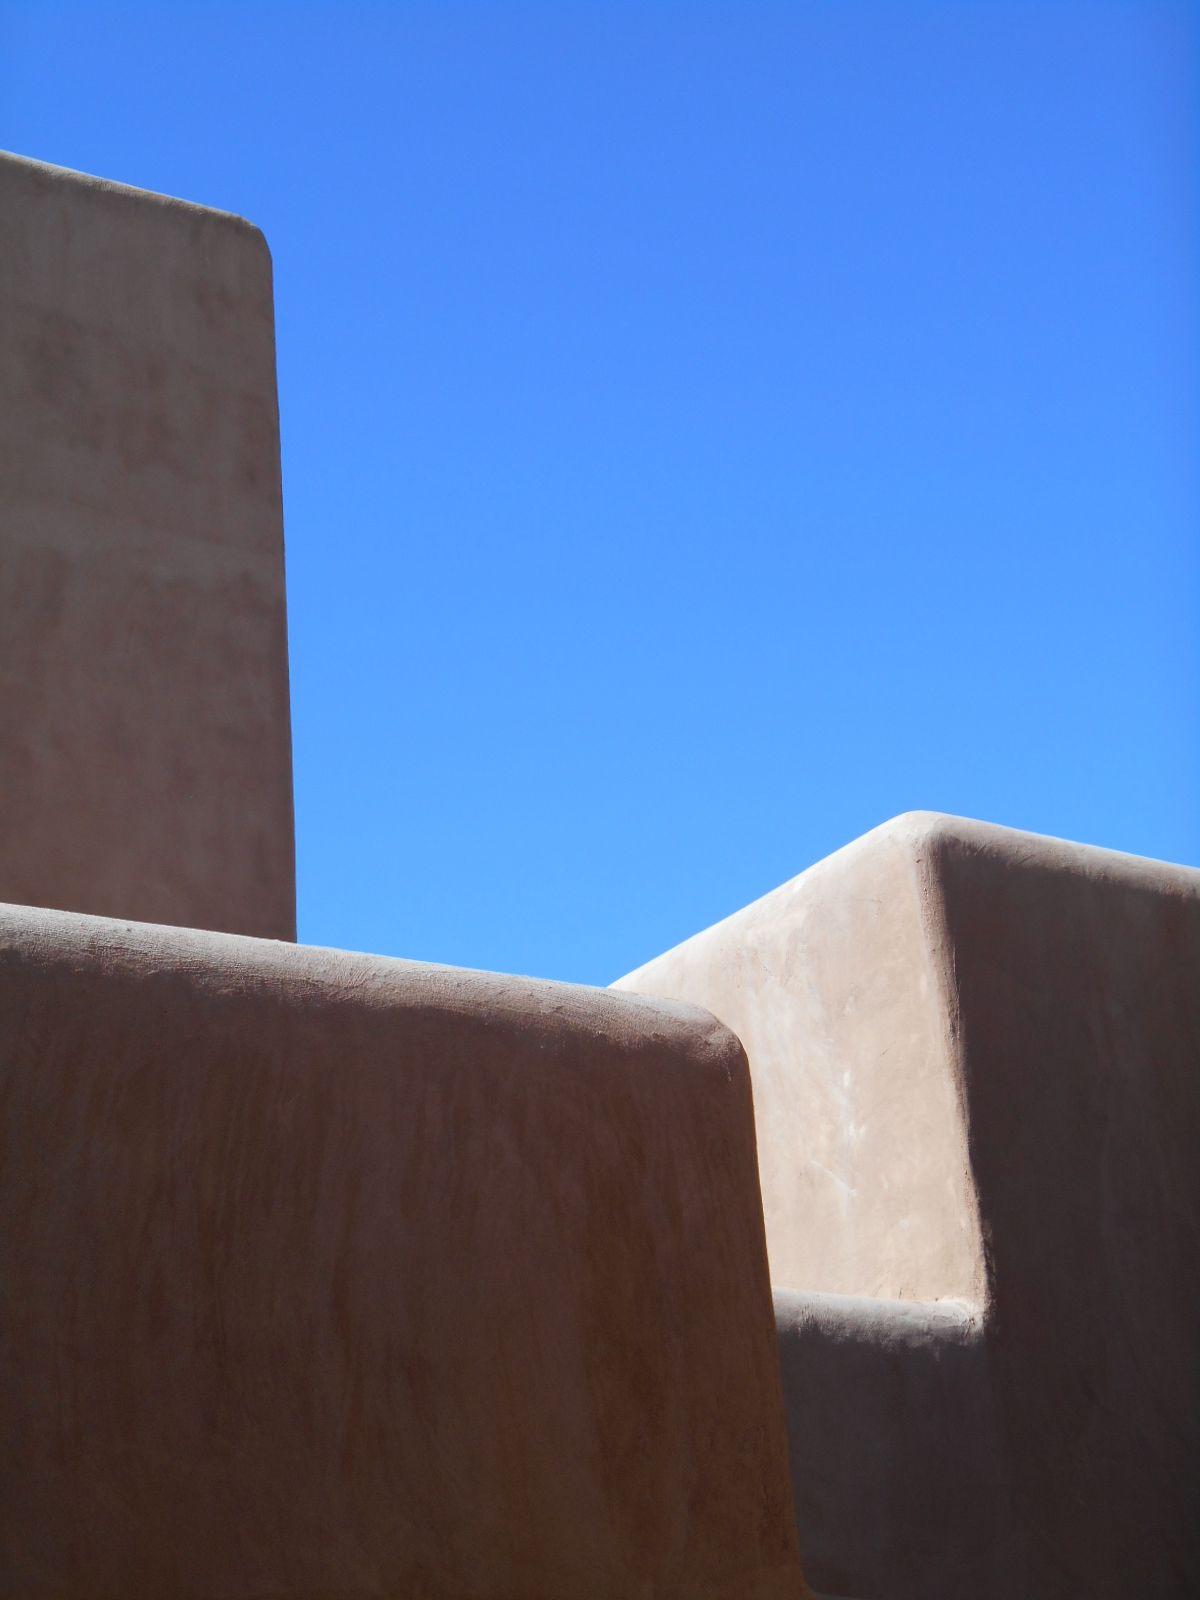 Detalle en Santa Fe NM EEUU Fotografia ARQ: LUCIA GARZON